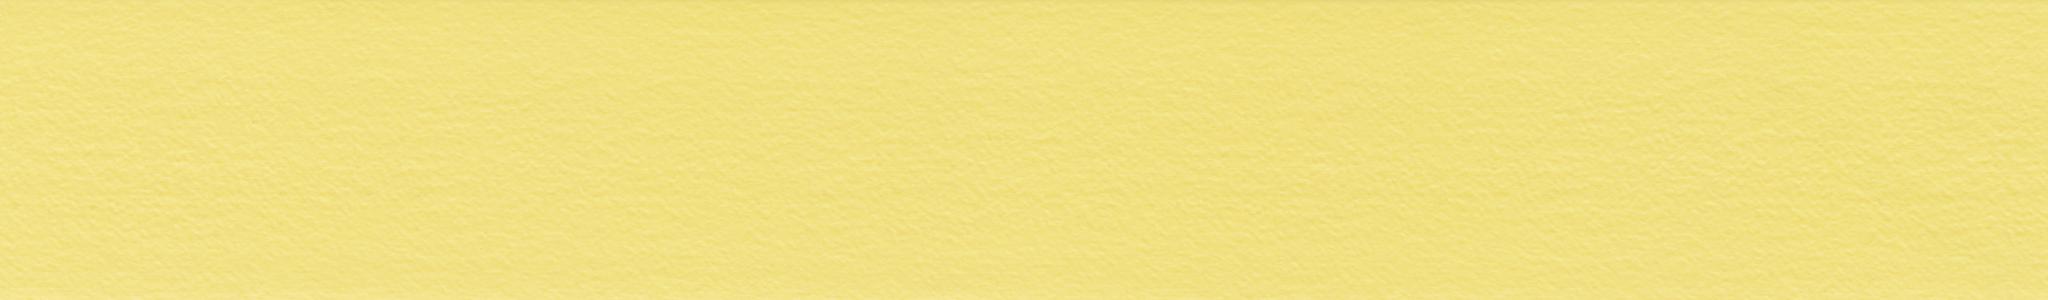 HU 11687 ABS Kante UNI Gelb feinperl 107